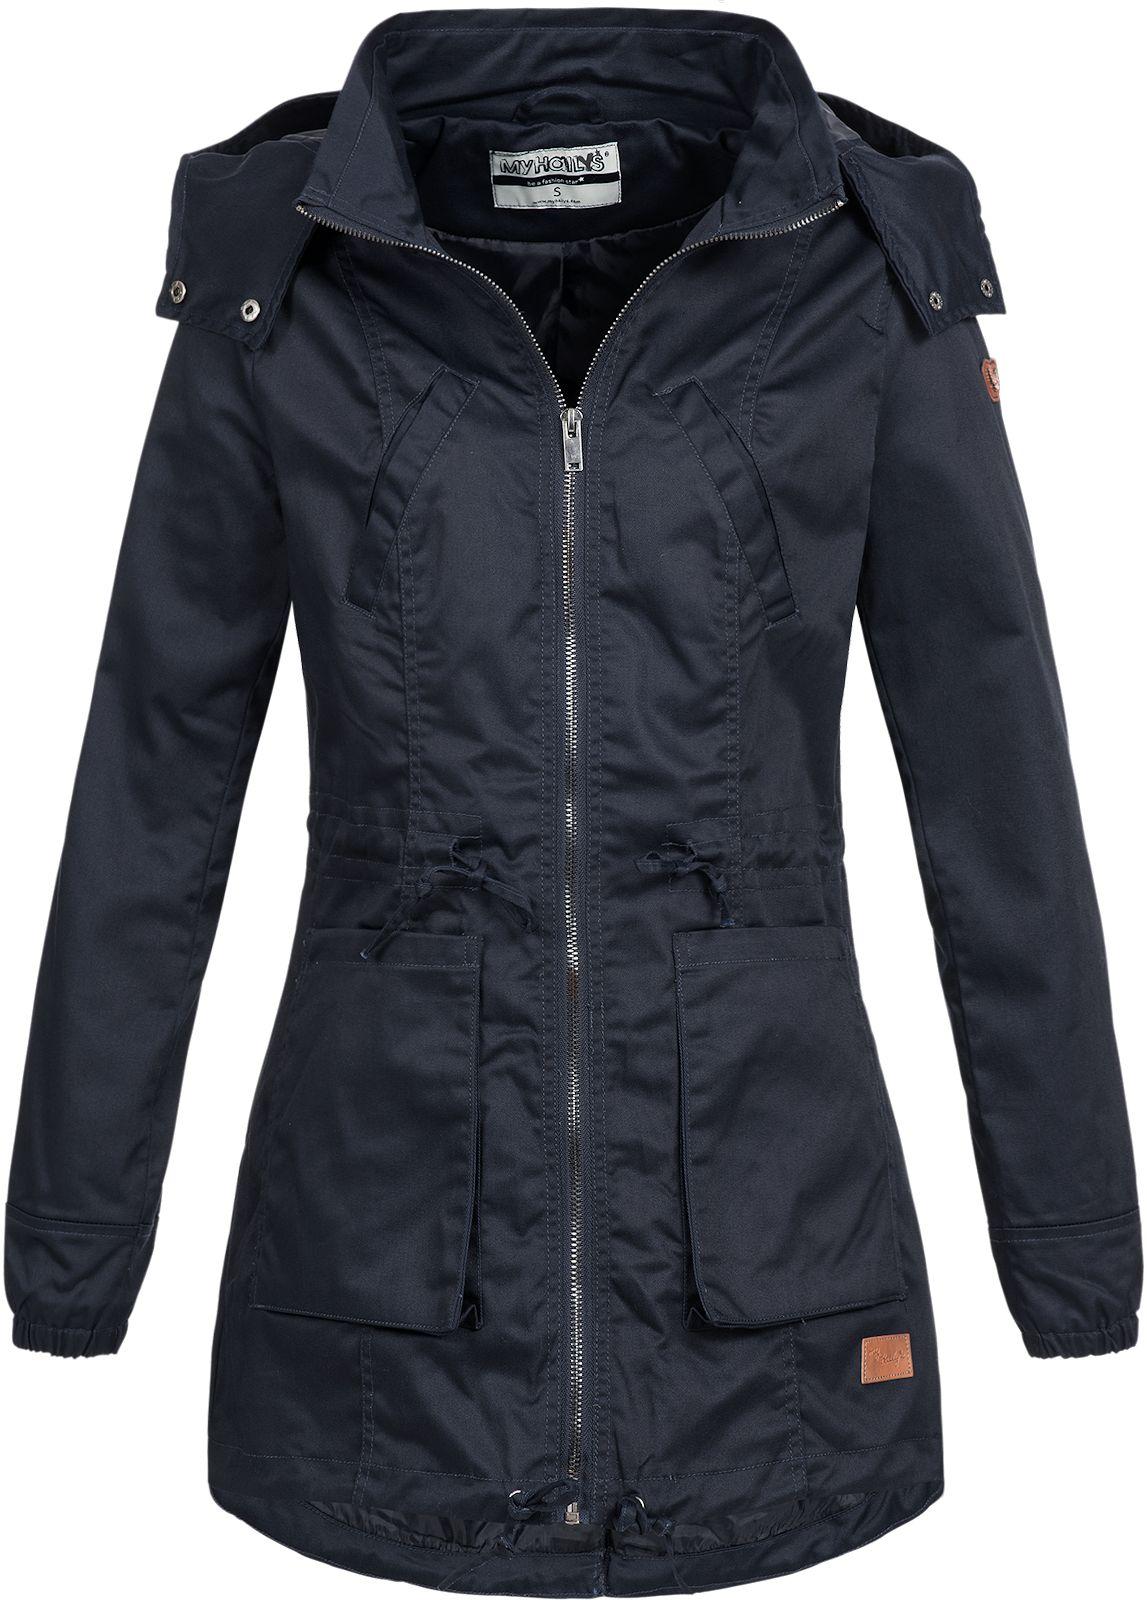 Details zu Hailys Damen Jacke Übergangsjacke Damenjacke Kapuze Casual Sonja